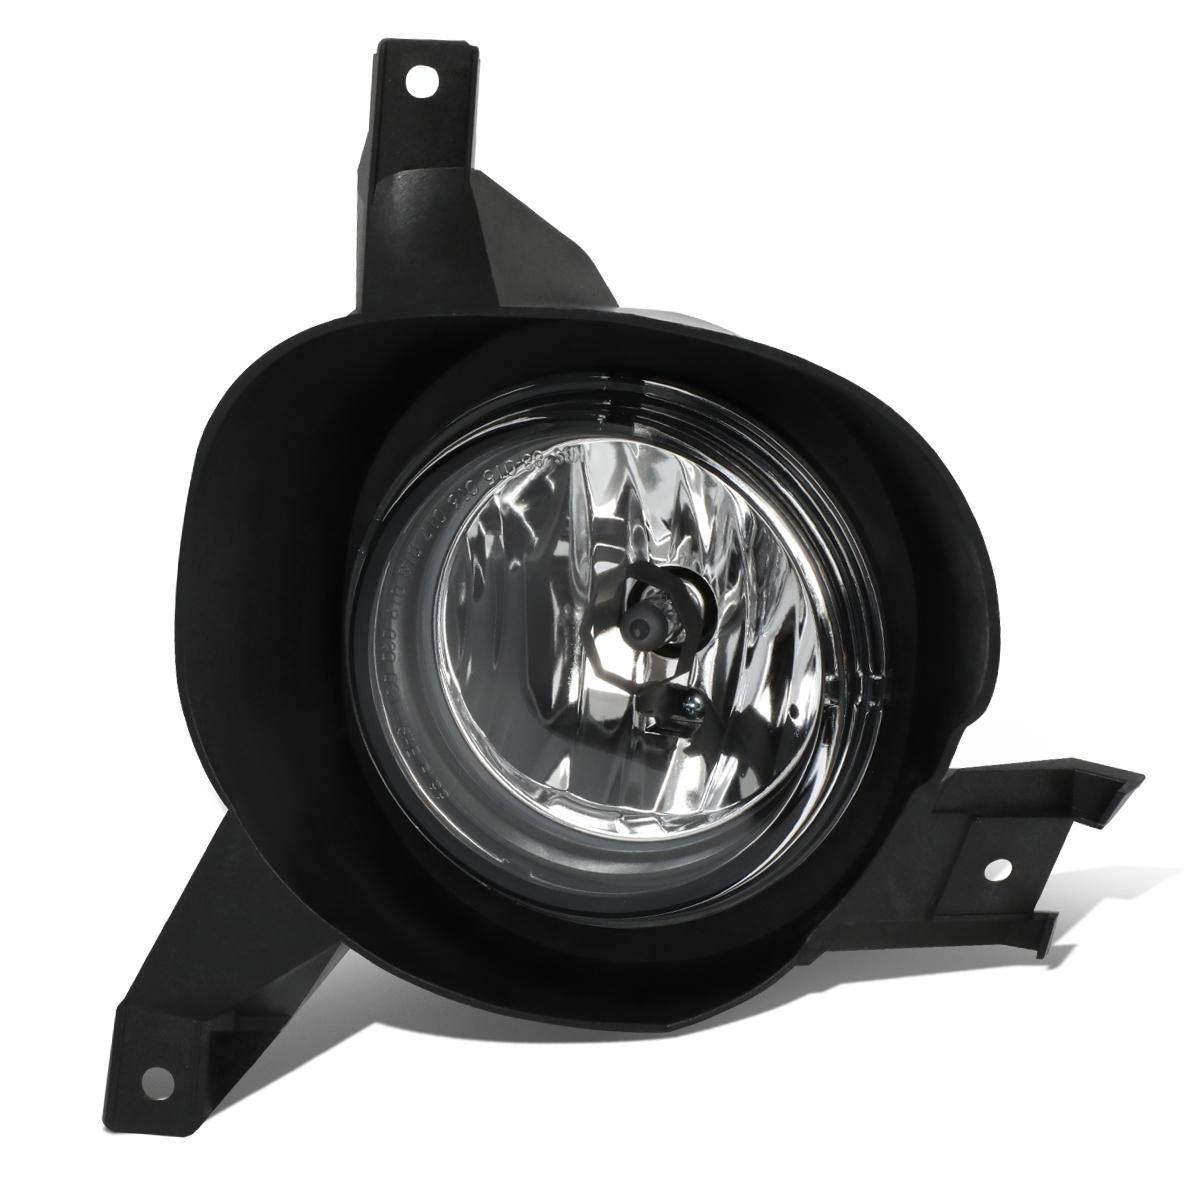 For 01-05 Ford Explorer Sport Trac Front Bumper Fog Light/Lamp Factory Style Left Side 02 03 04